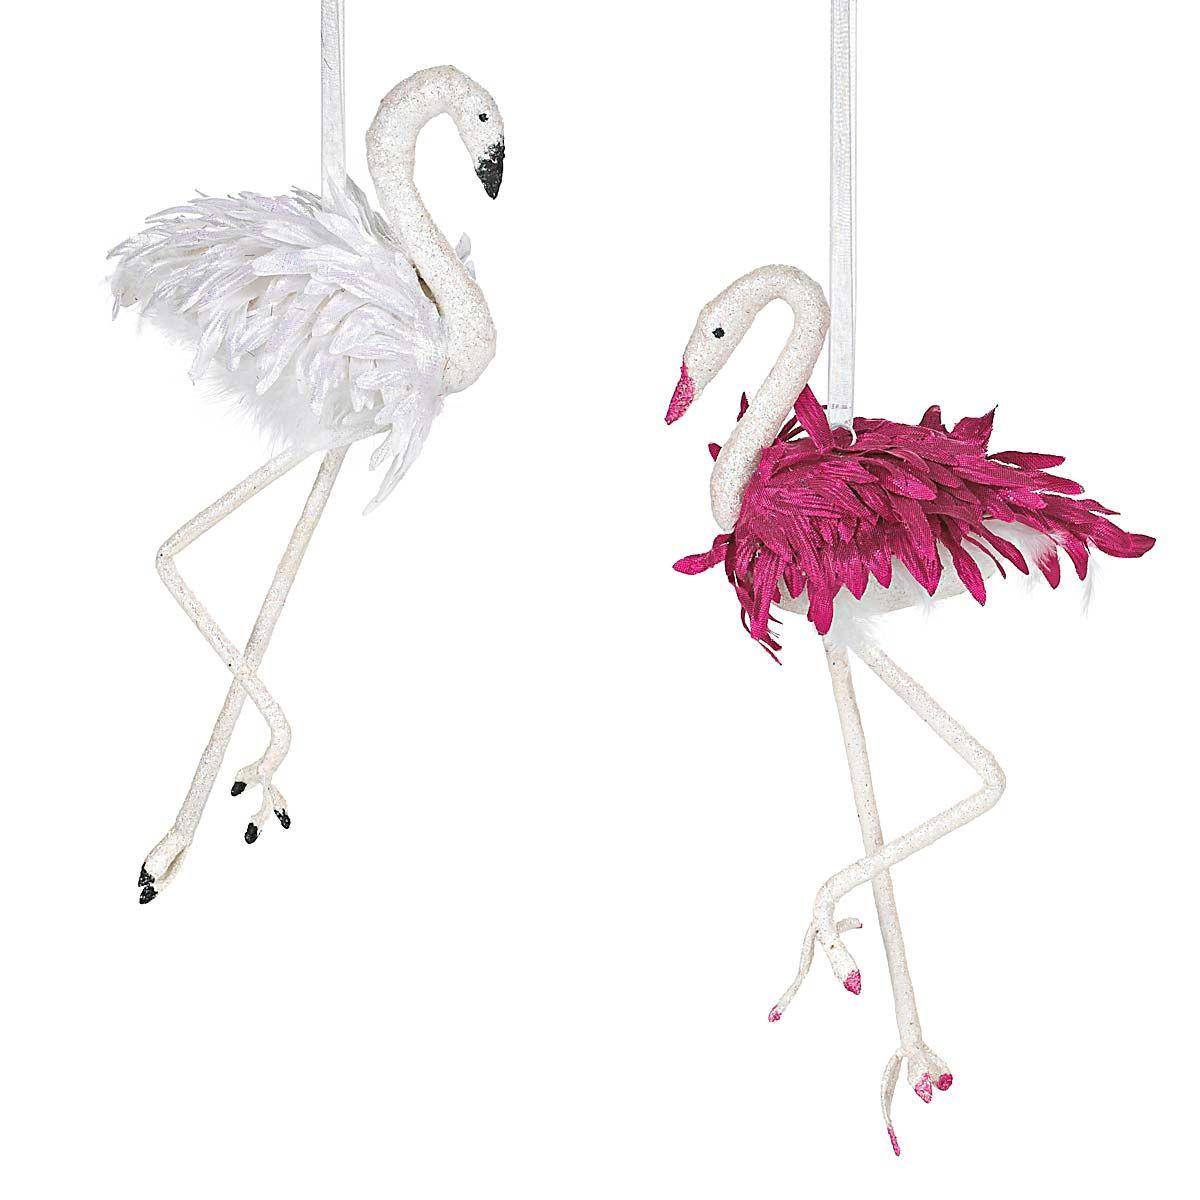 Flamingo ornaments, perhaps for the Christmas tree;) I Like